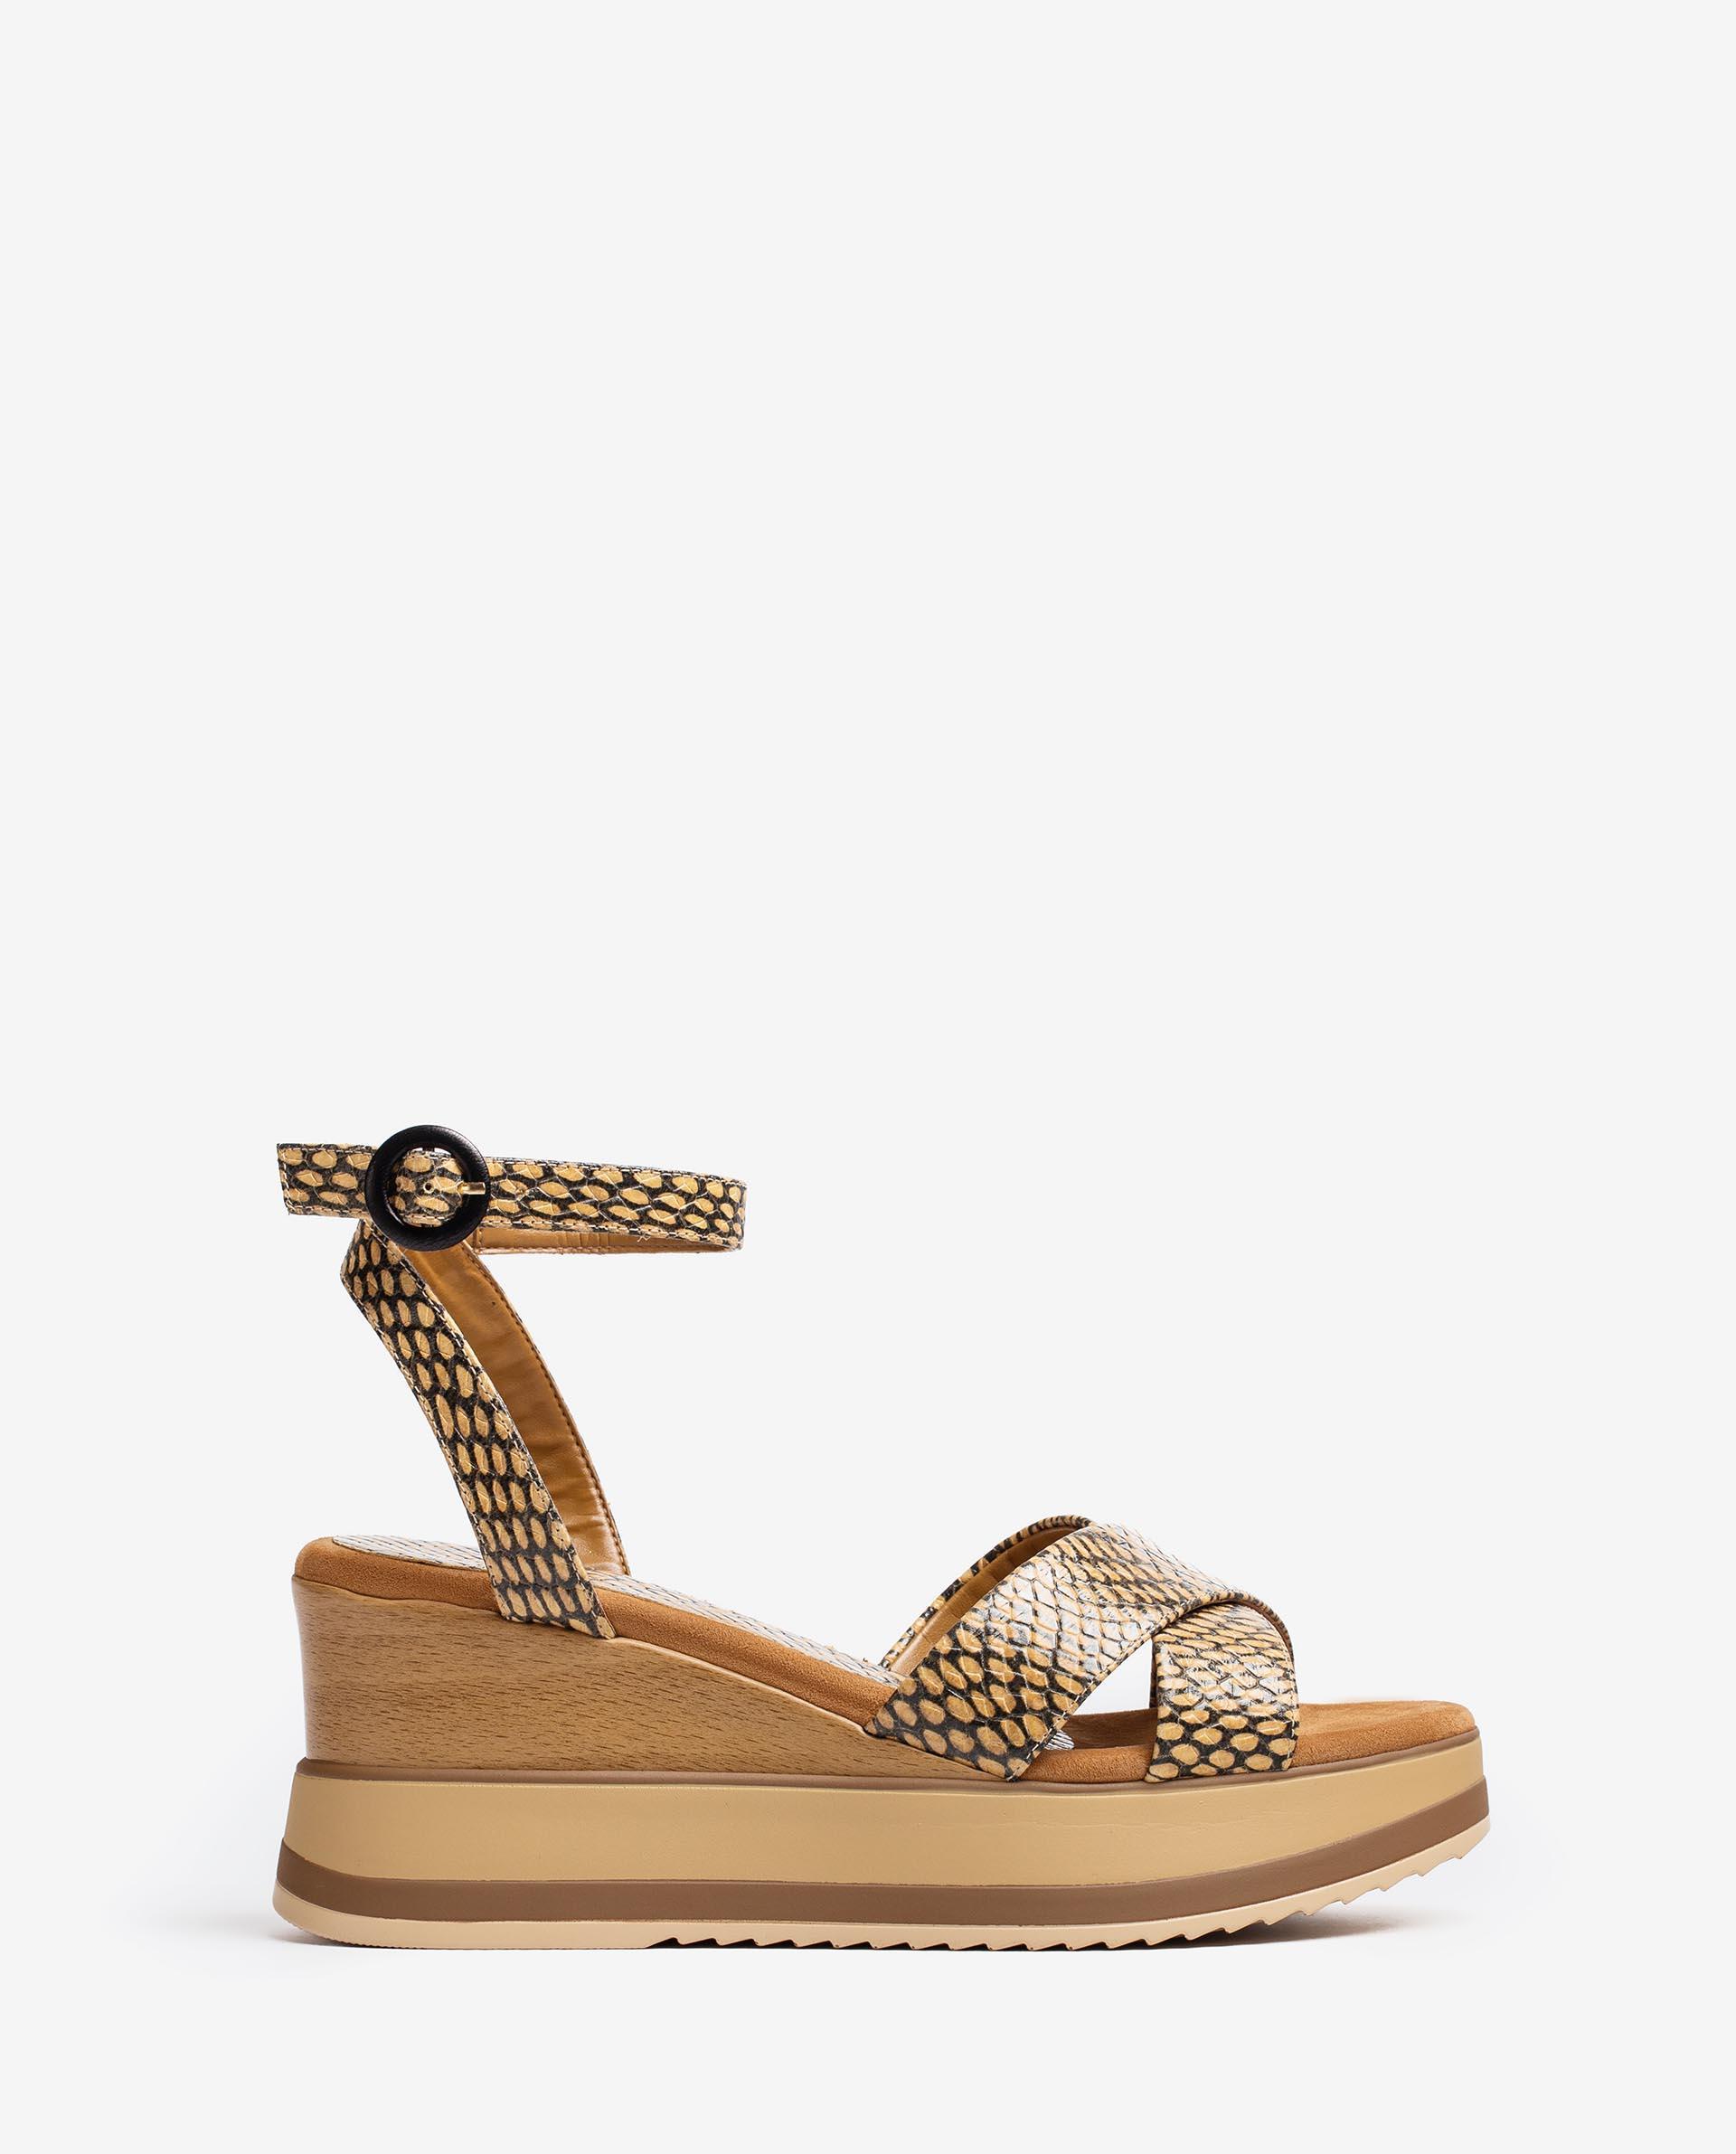 UNISA Sandalen aus Leder mit Snake-Print und Sportsohle KADIO_MA 5